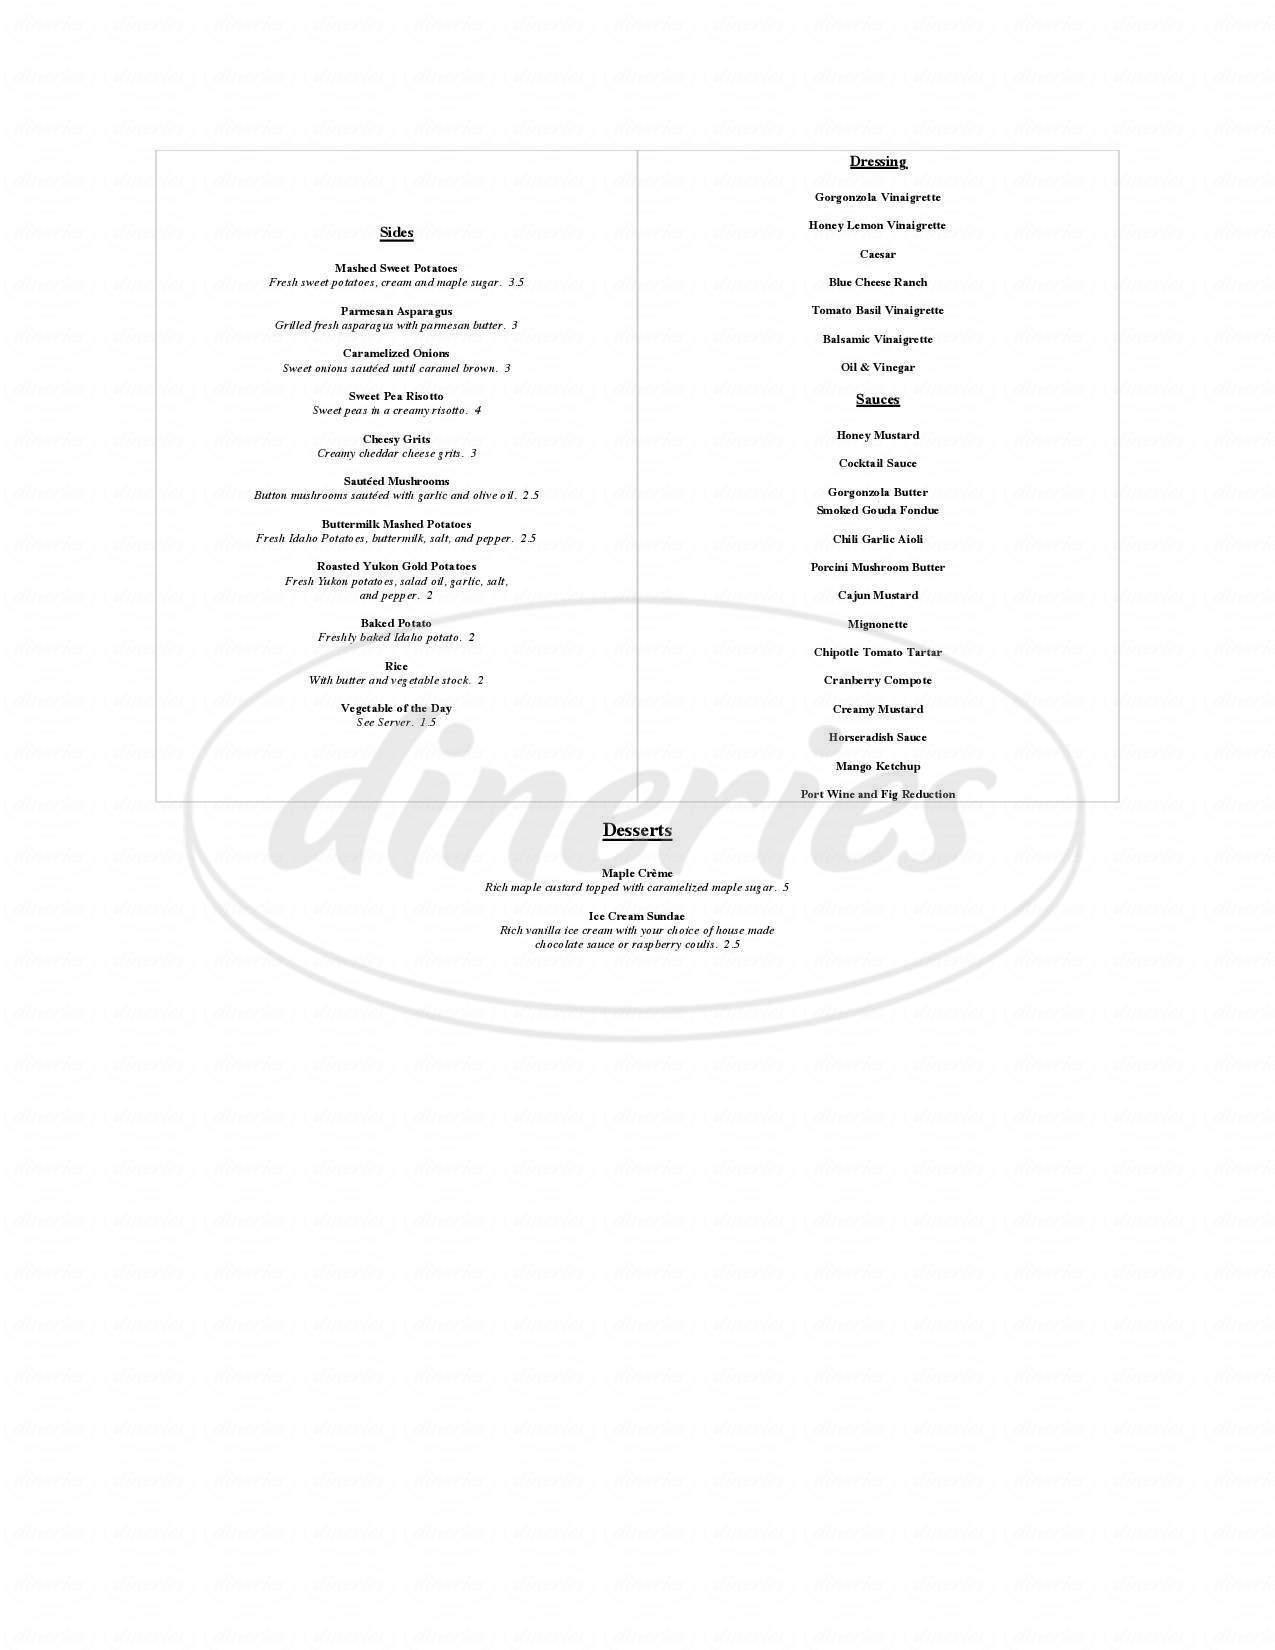 menu for Eastside Grill